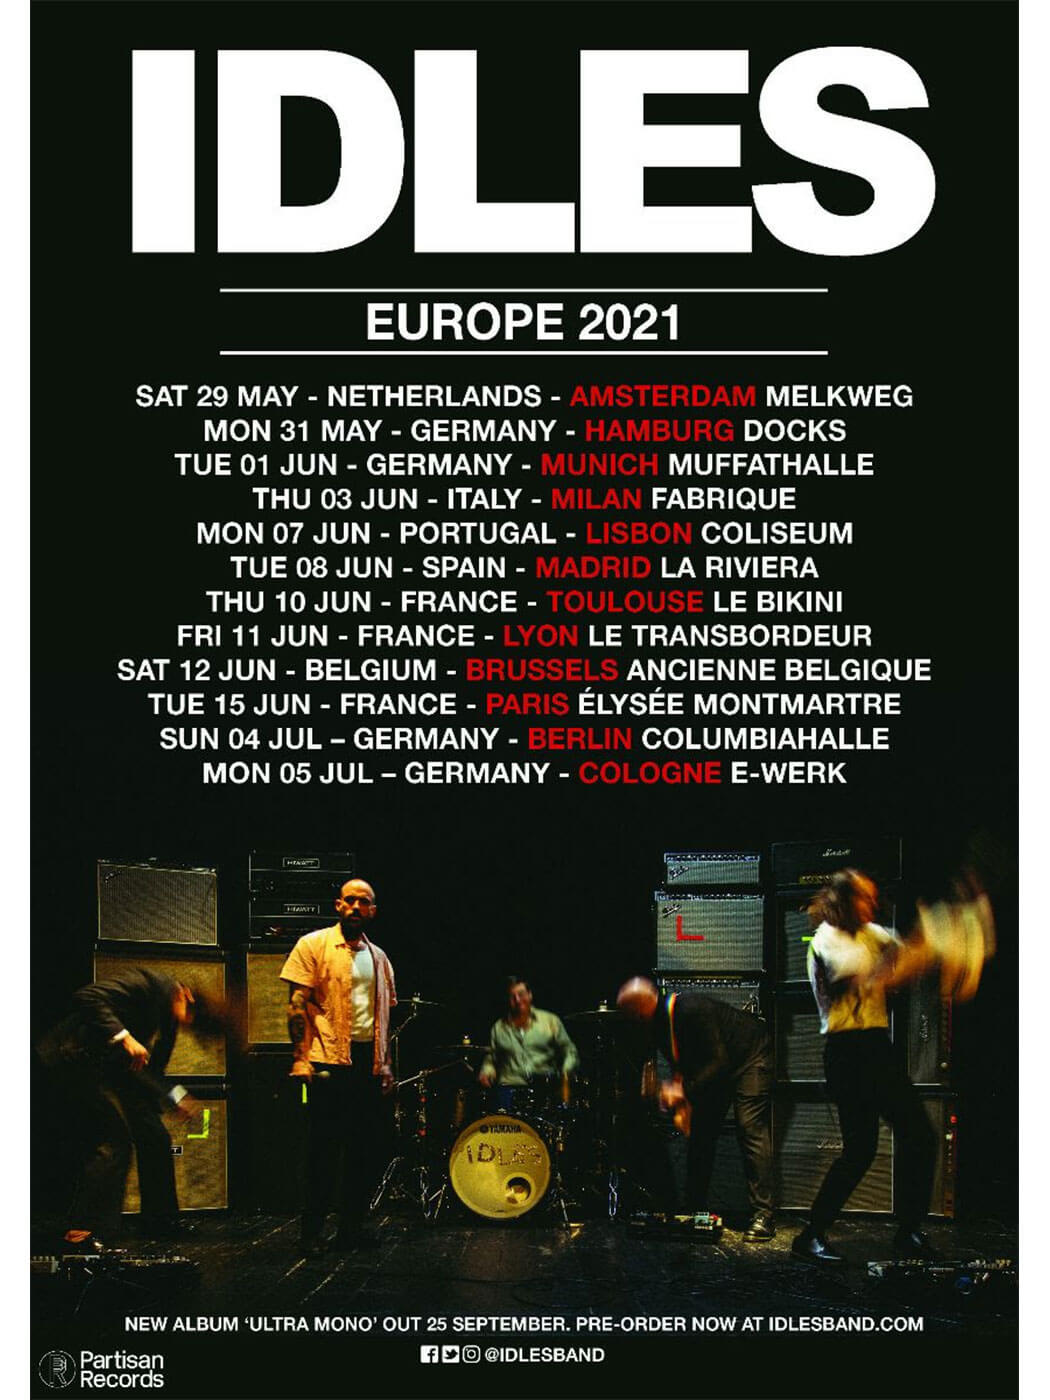 IDLES 2021 EU tour